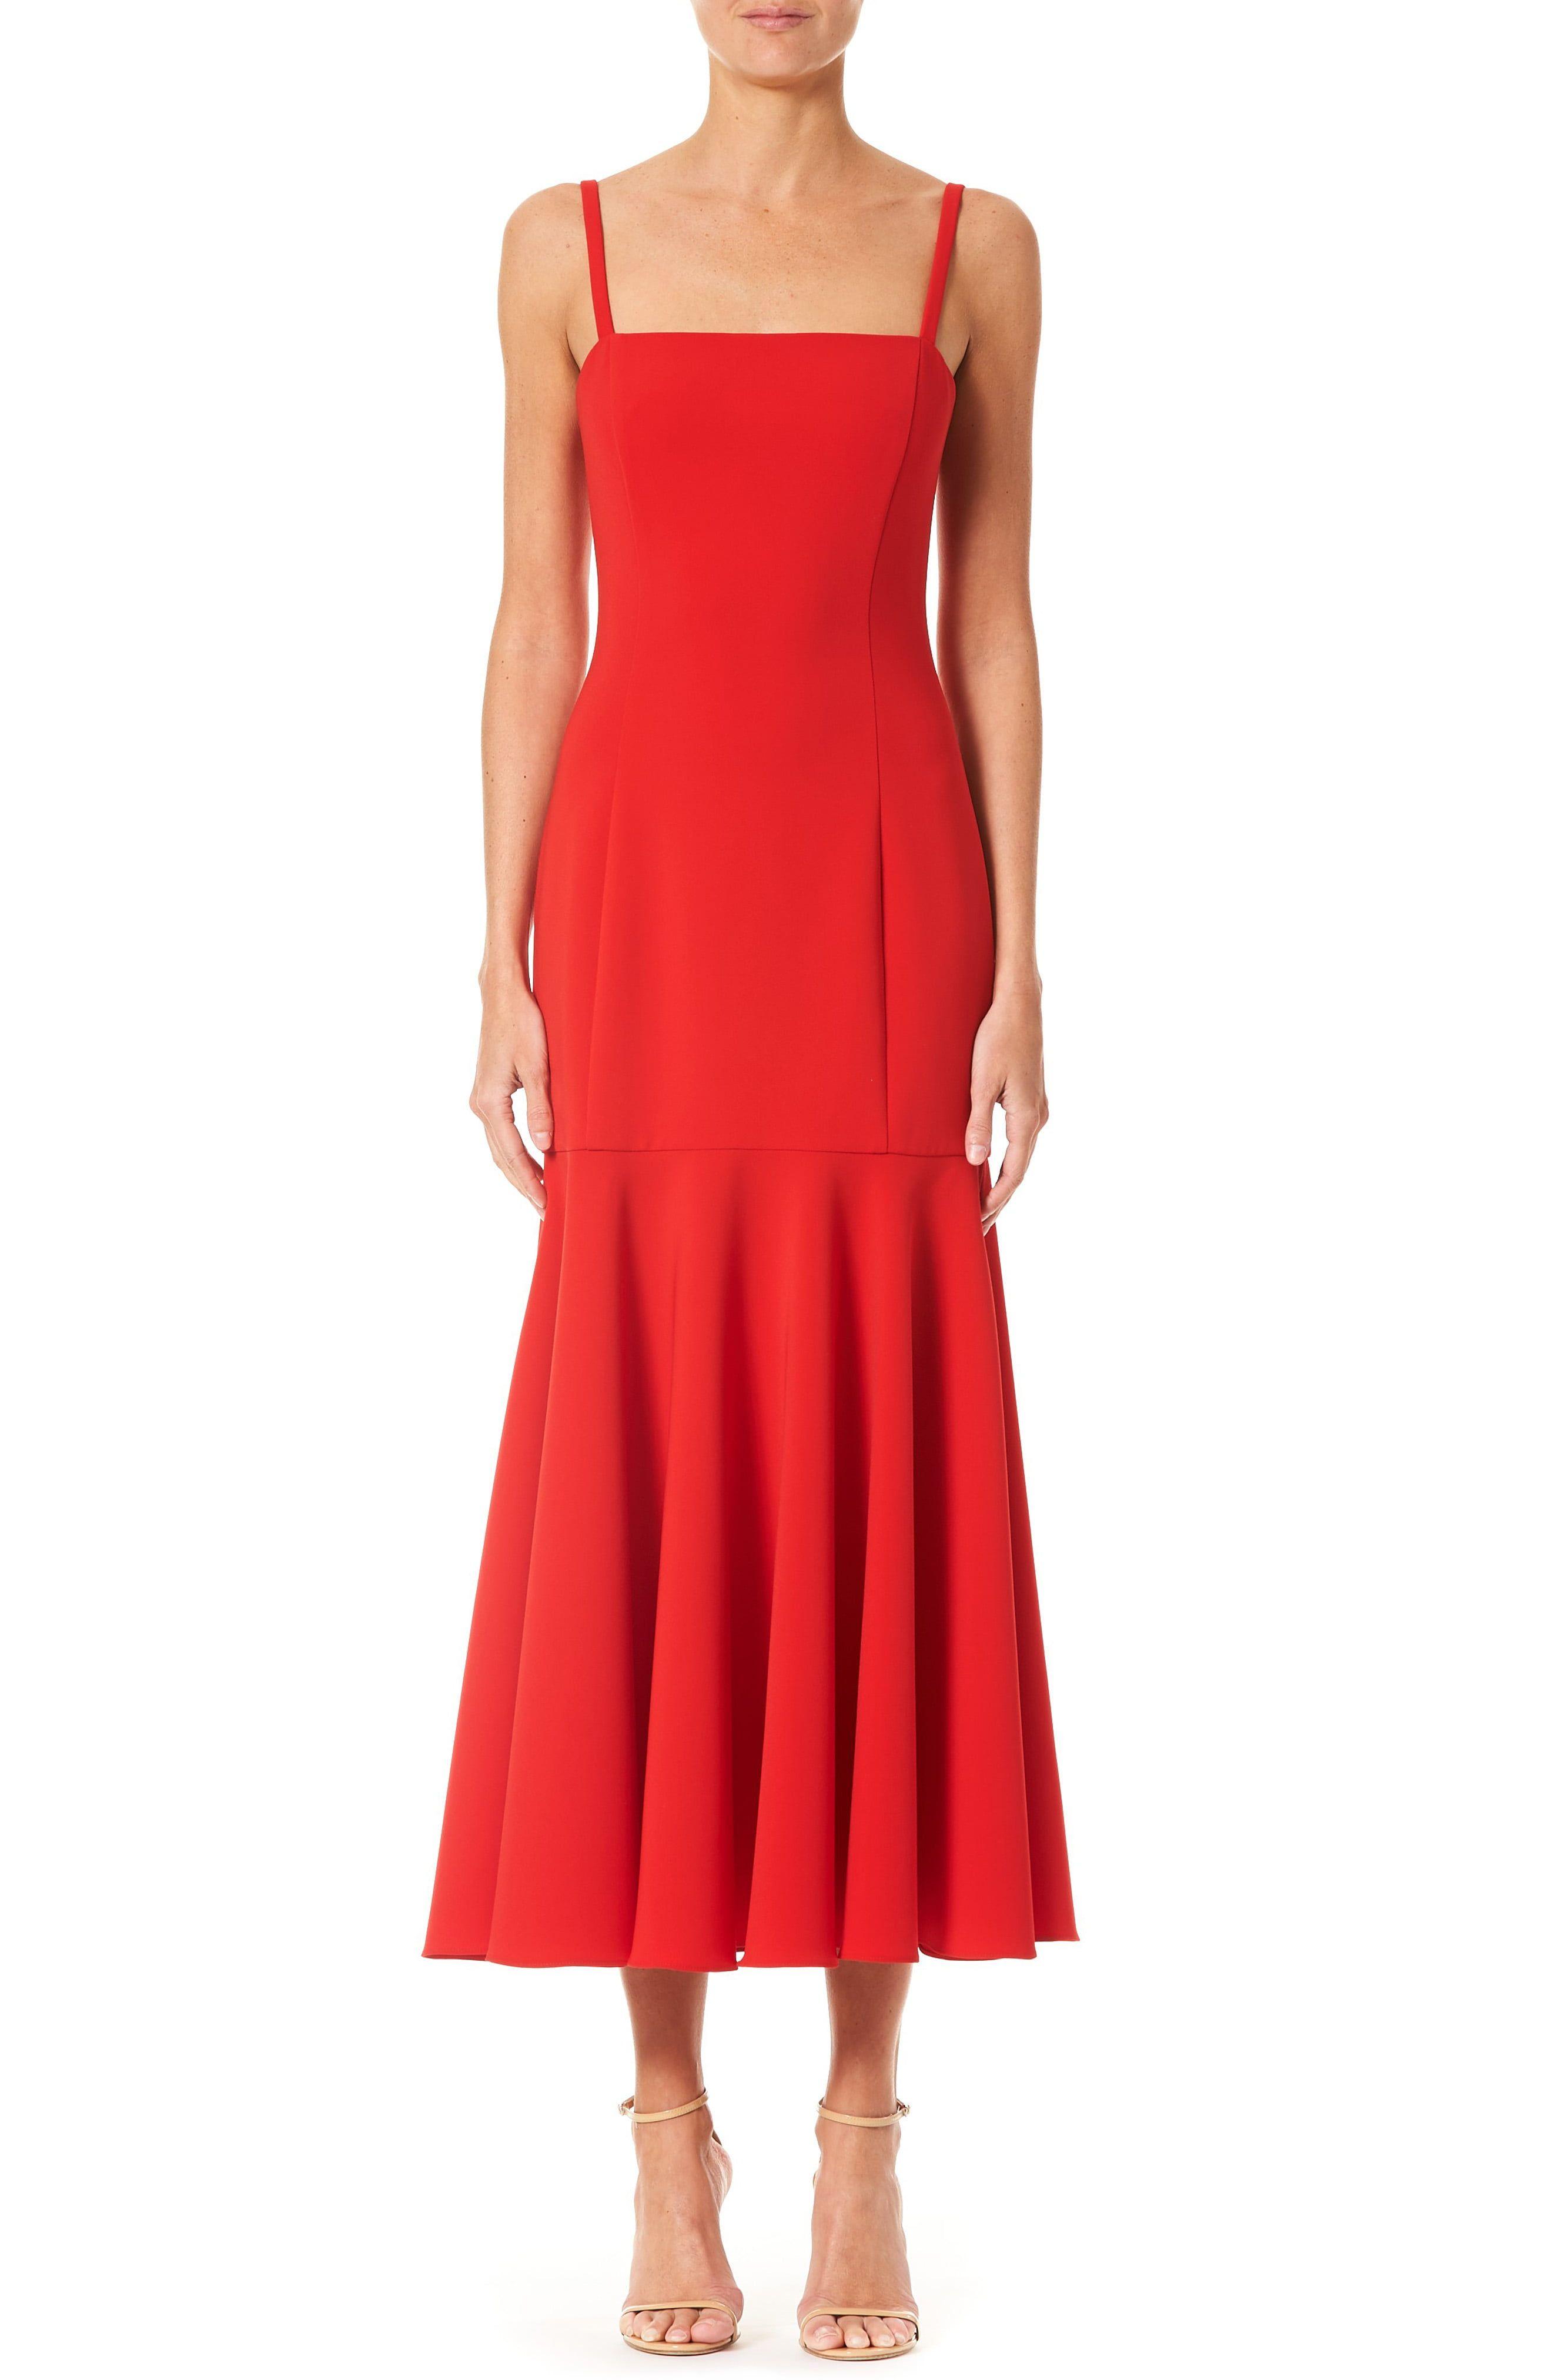 Carolina Herrera Ruffle Hem Midi Dress Nordstrom Midi Sheath Dress Dresses Carolina Herrera Dresses [ 4048 x 2640 Pixel ]